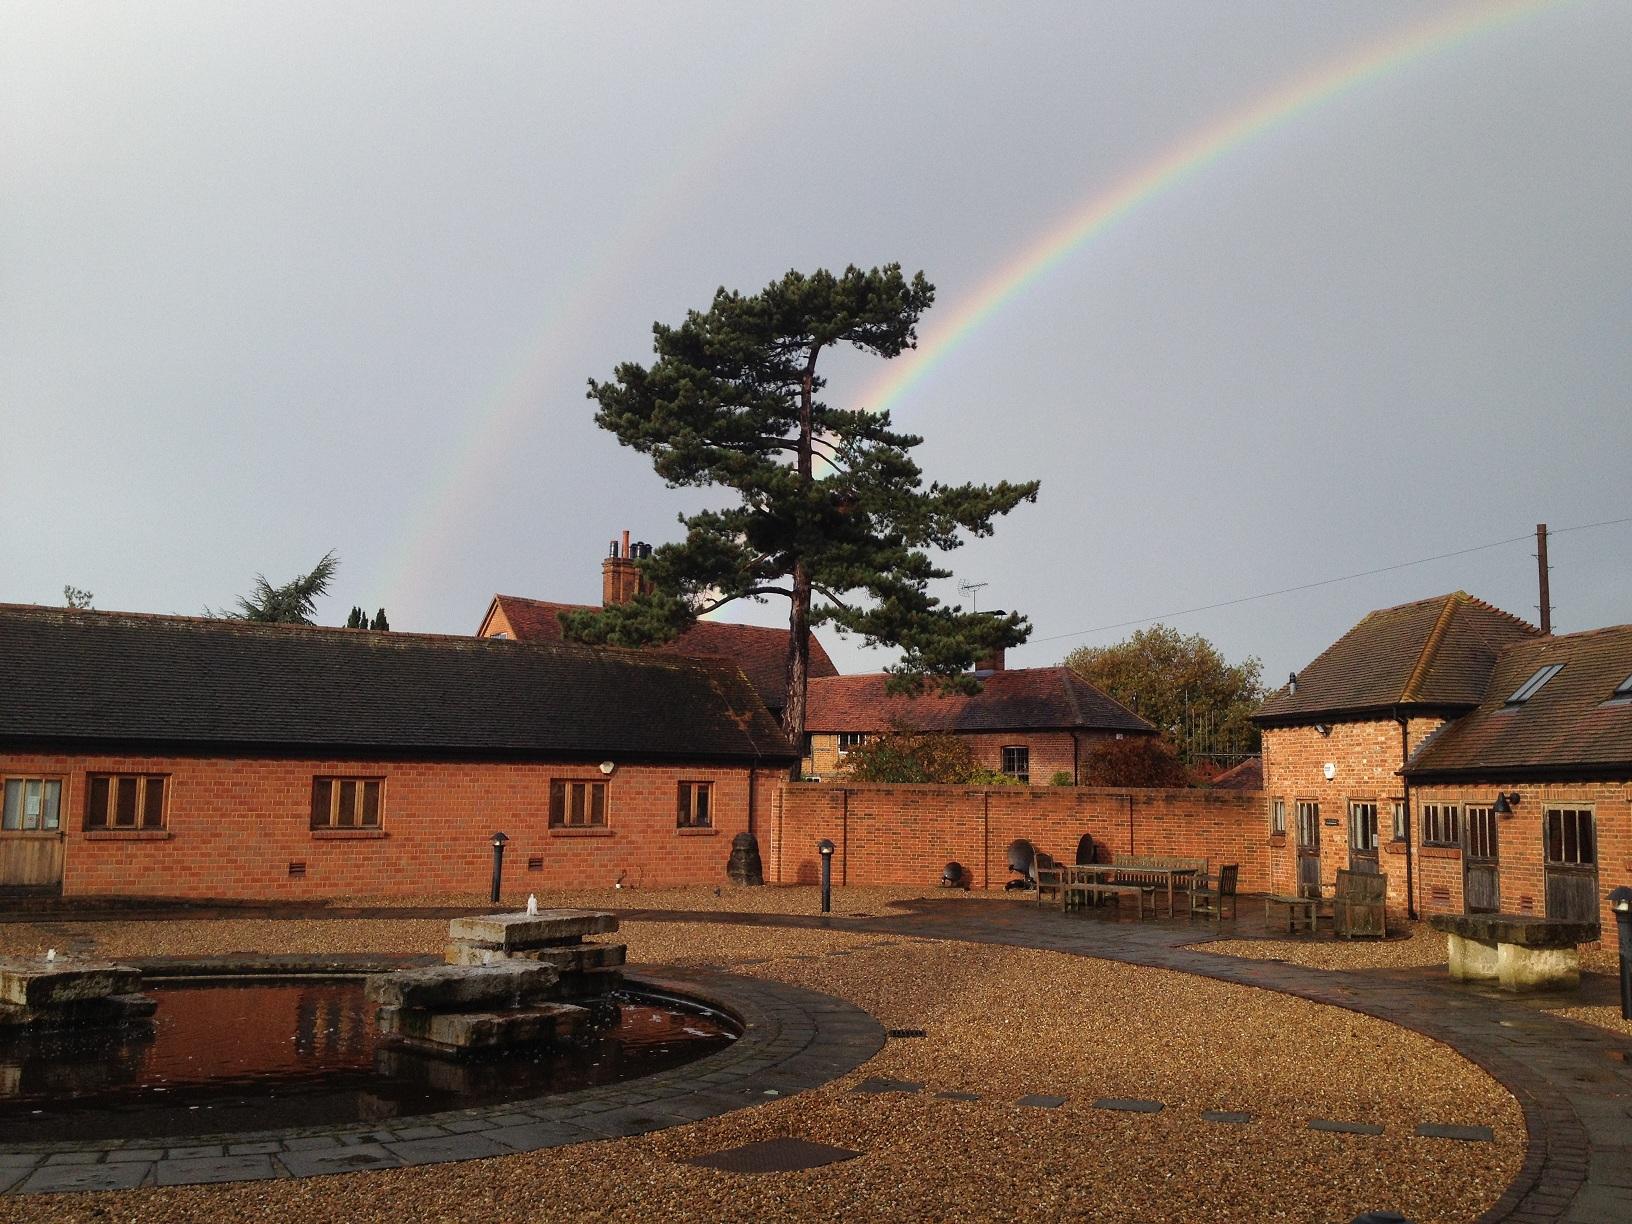 Wisley with rainbow